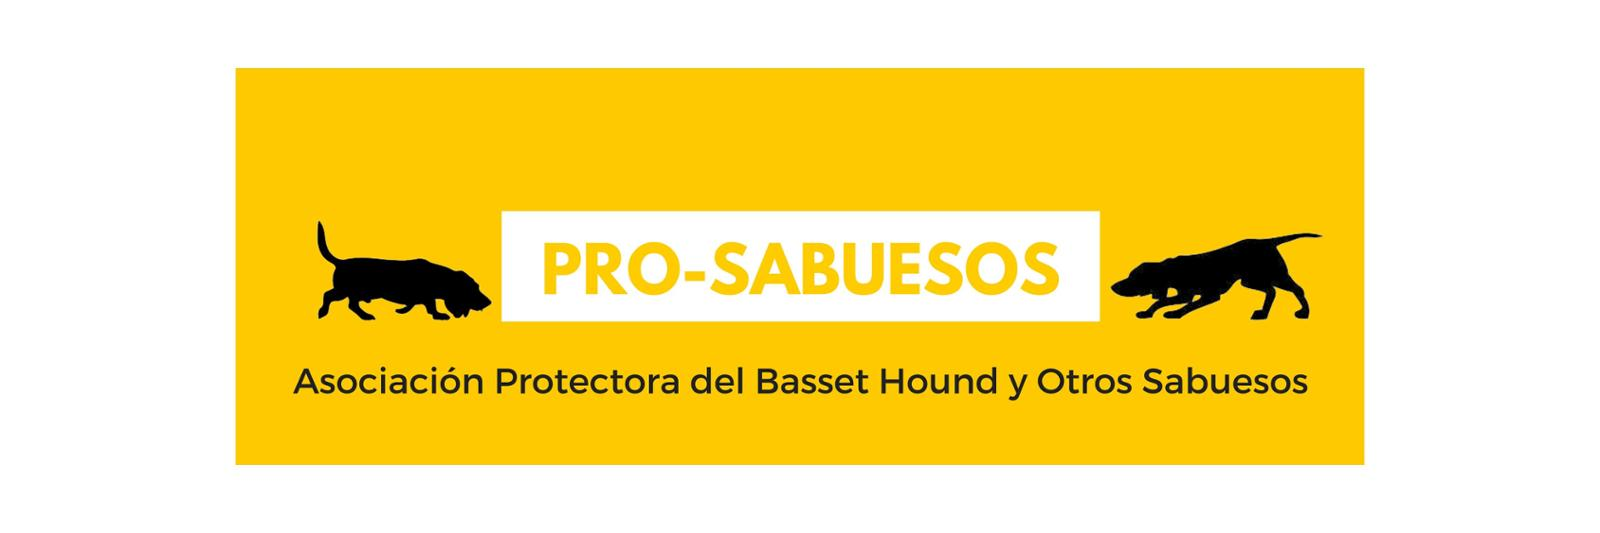 Asociación Protectora PRO-SABUESOS